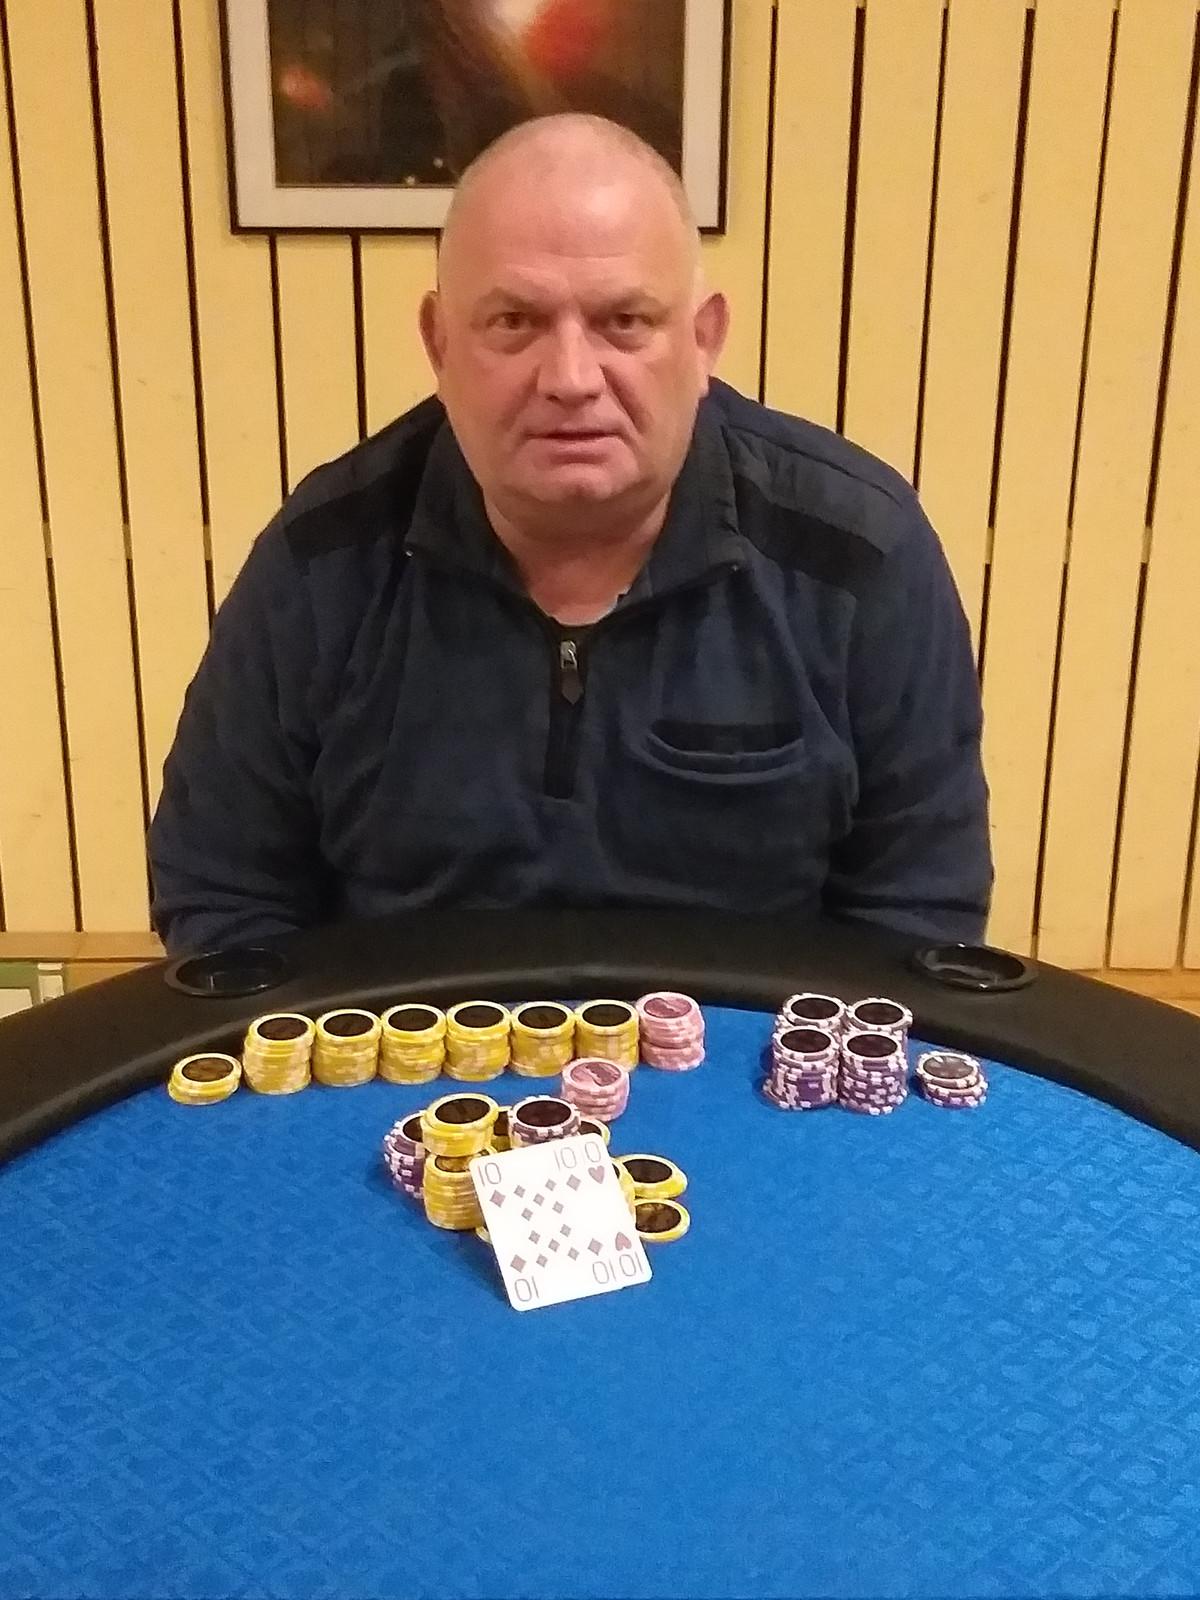 Poker Chancen Berechnen